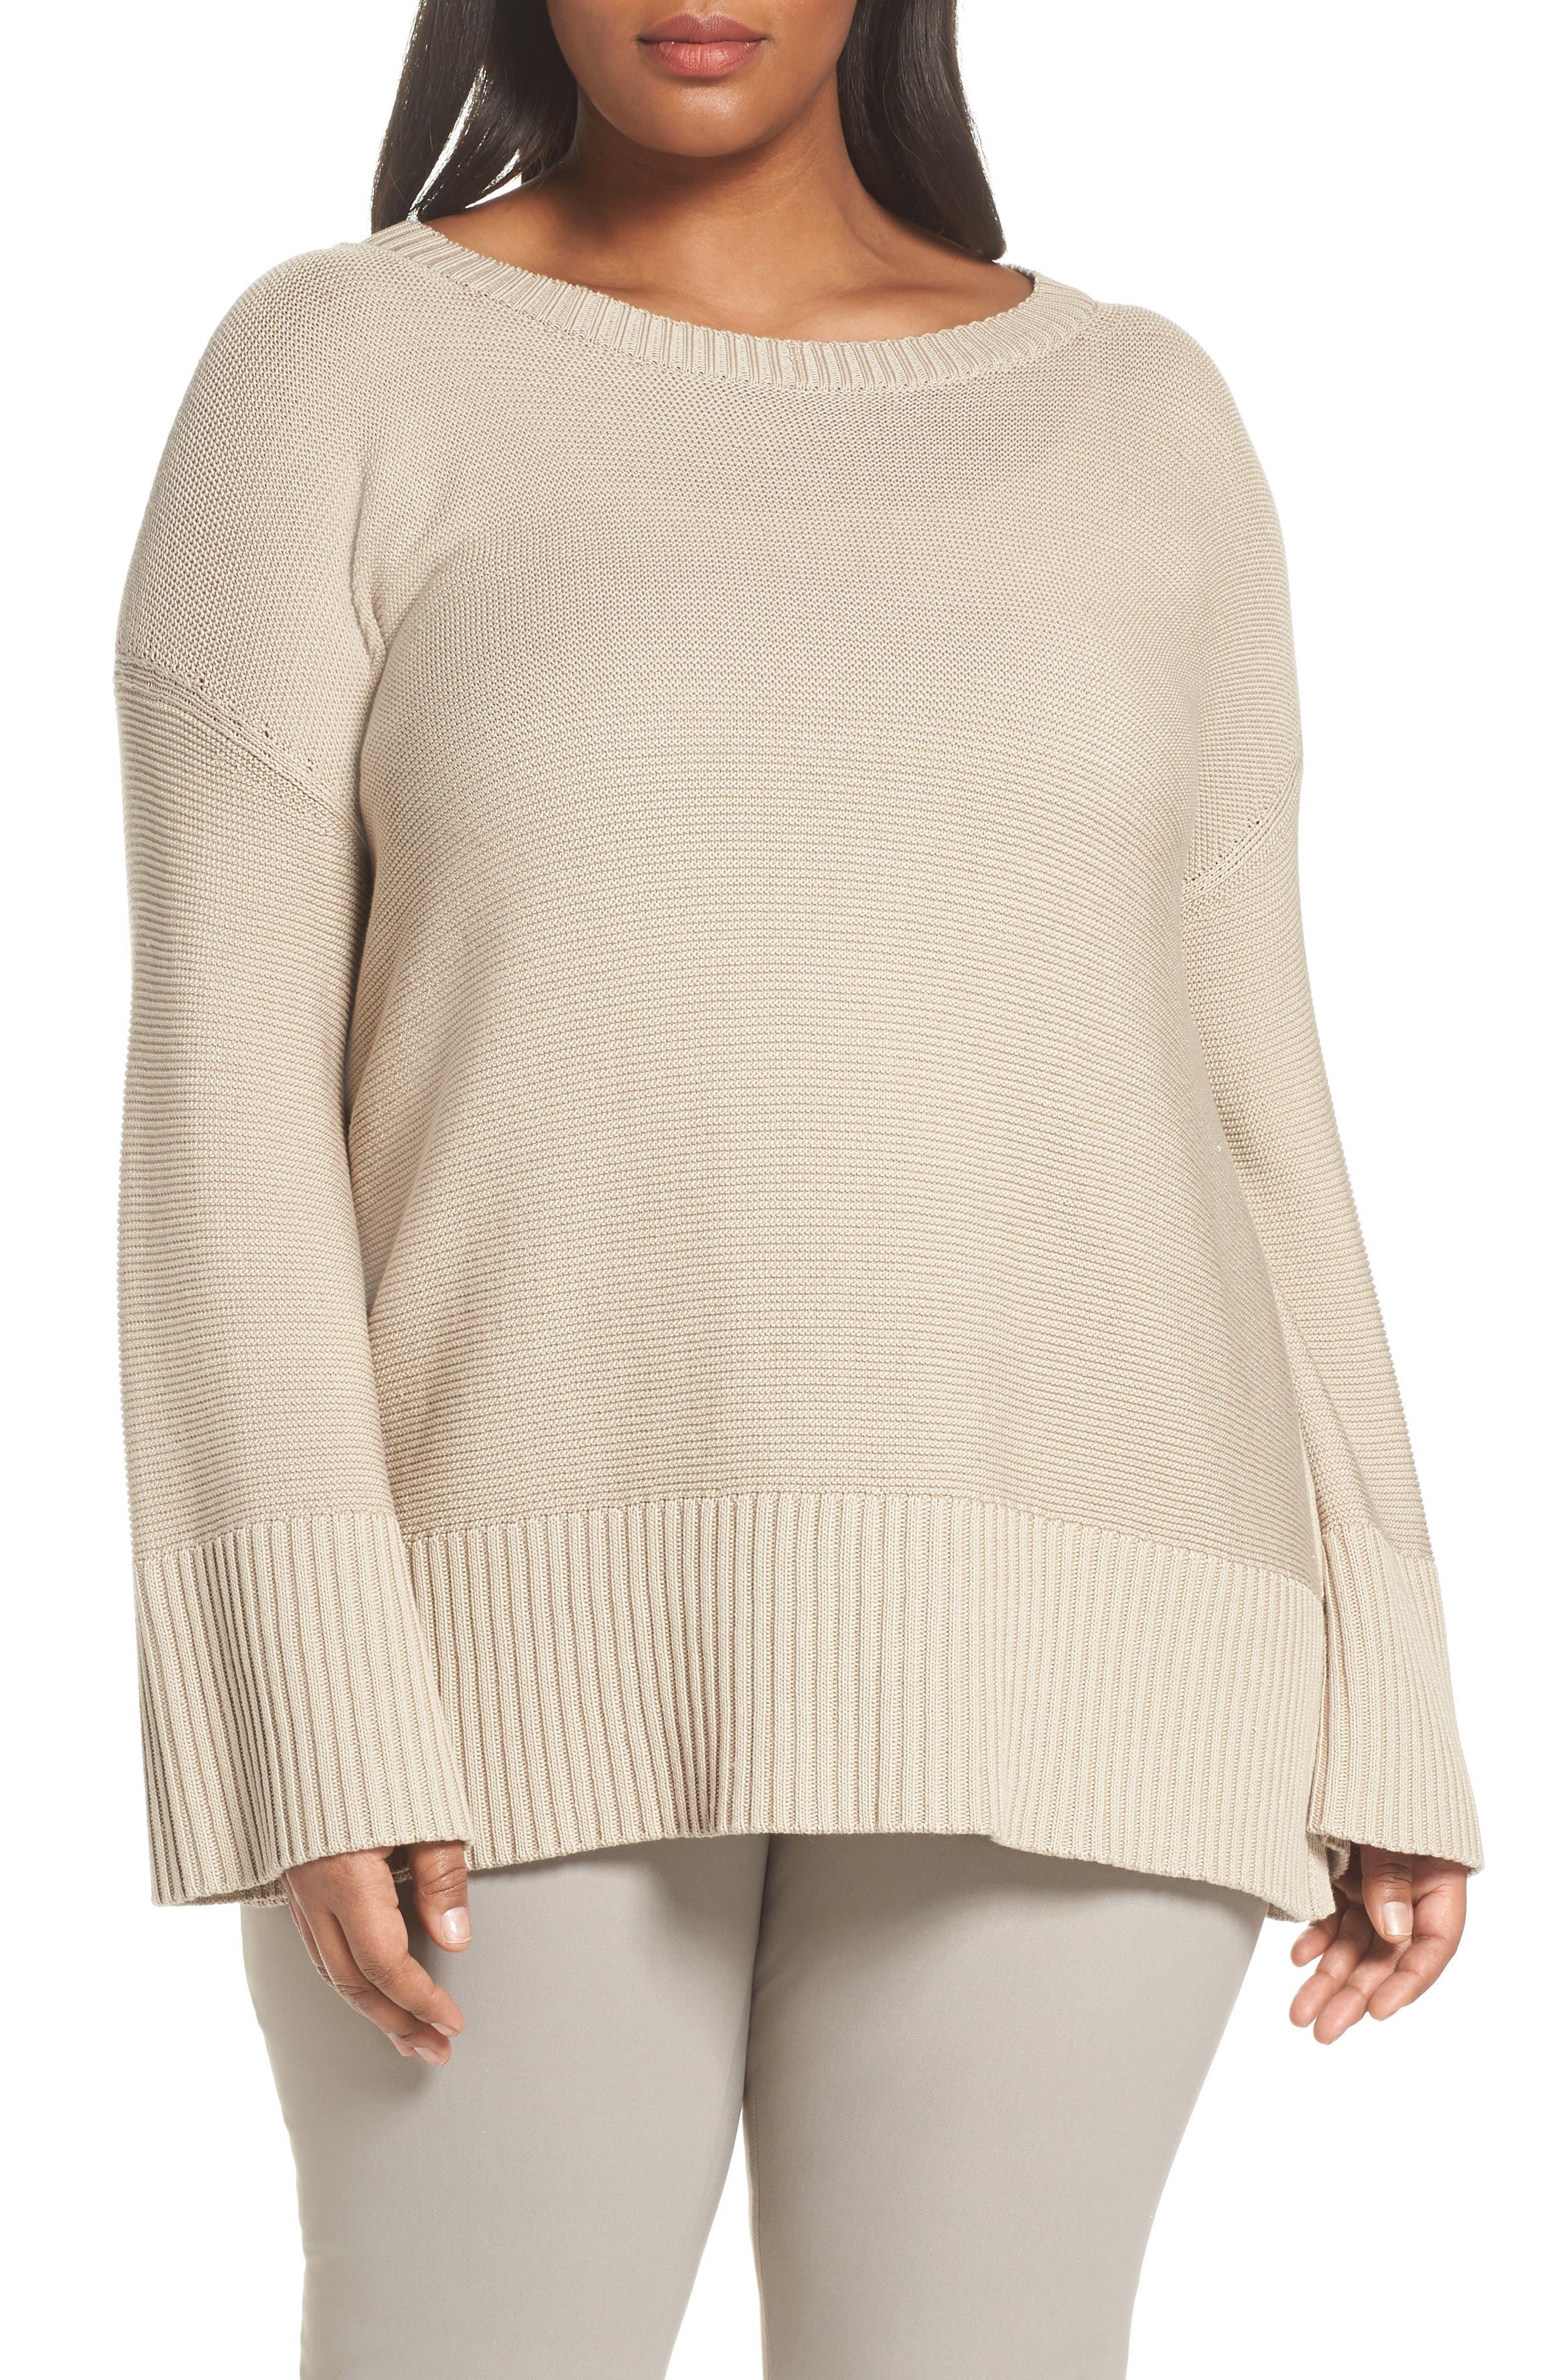 Lafayette 148 Silk and Cotton Sweater,                         Main,                         color, Khaki